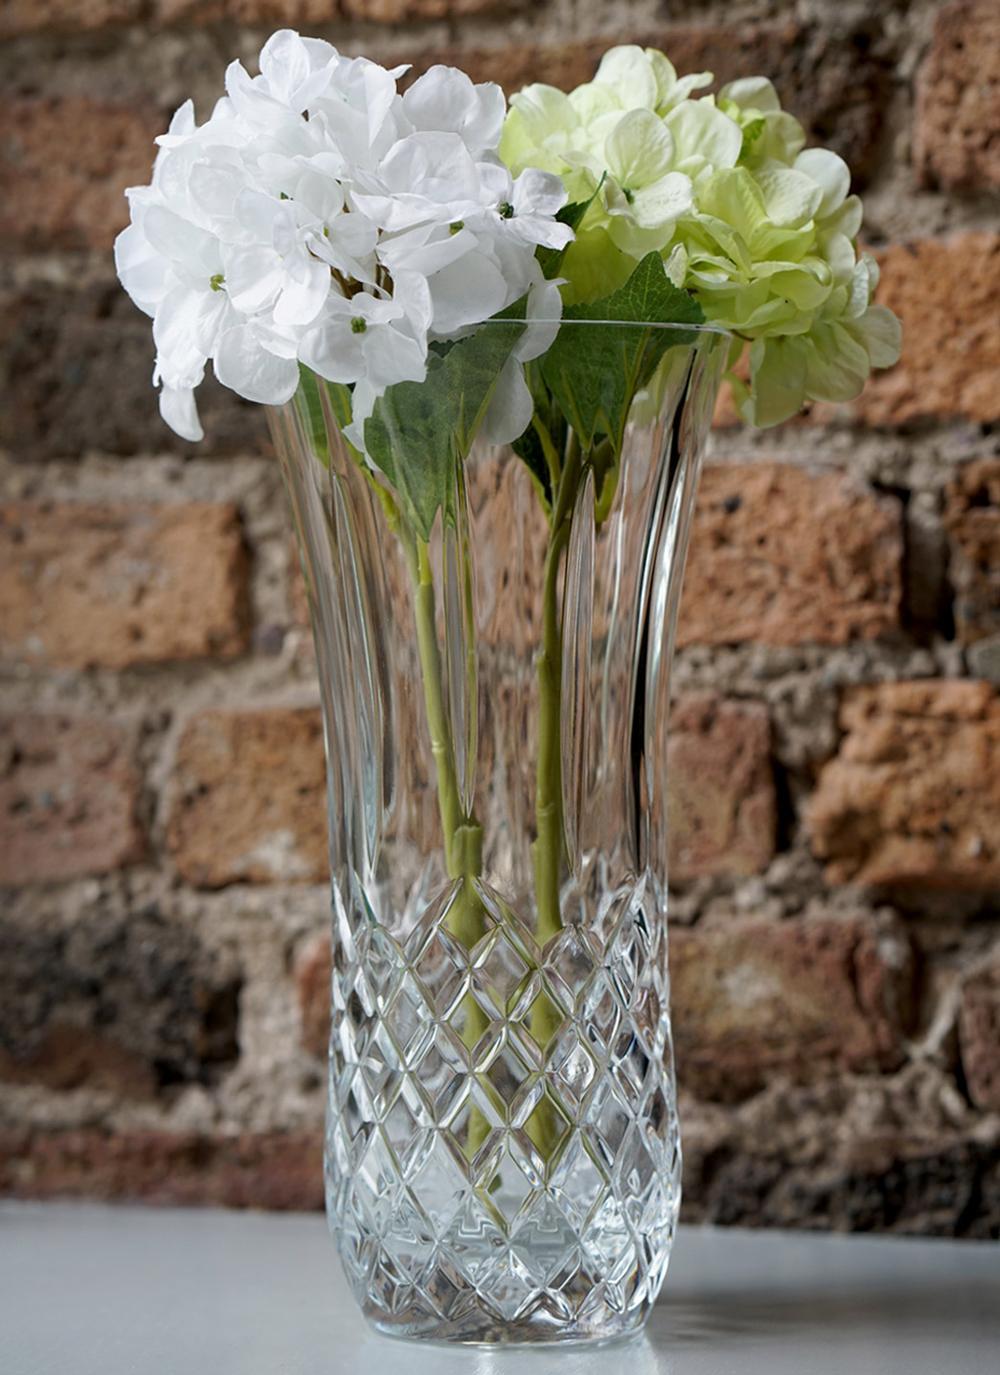 Waterford crystal marquis daffodil 115 vase blarney waterford crystal marquis daffodil 115 vase reviewsmspy